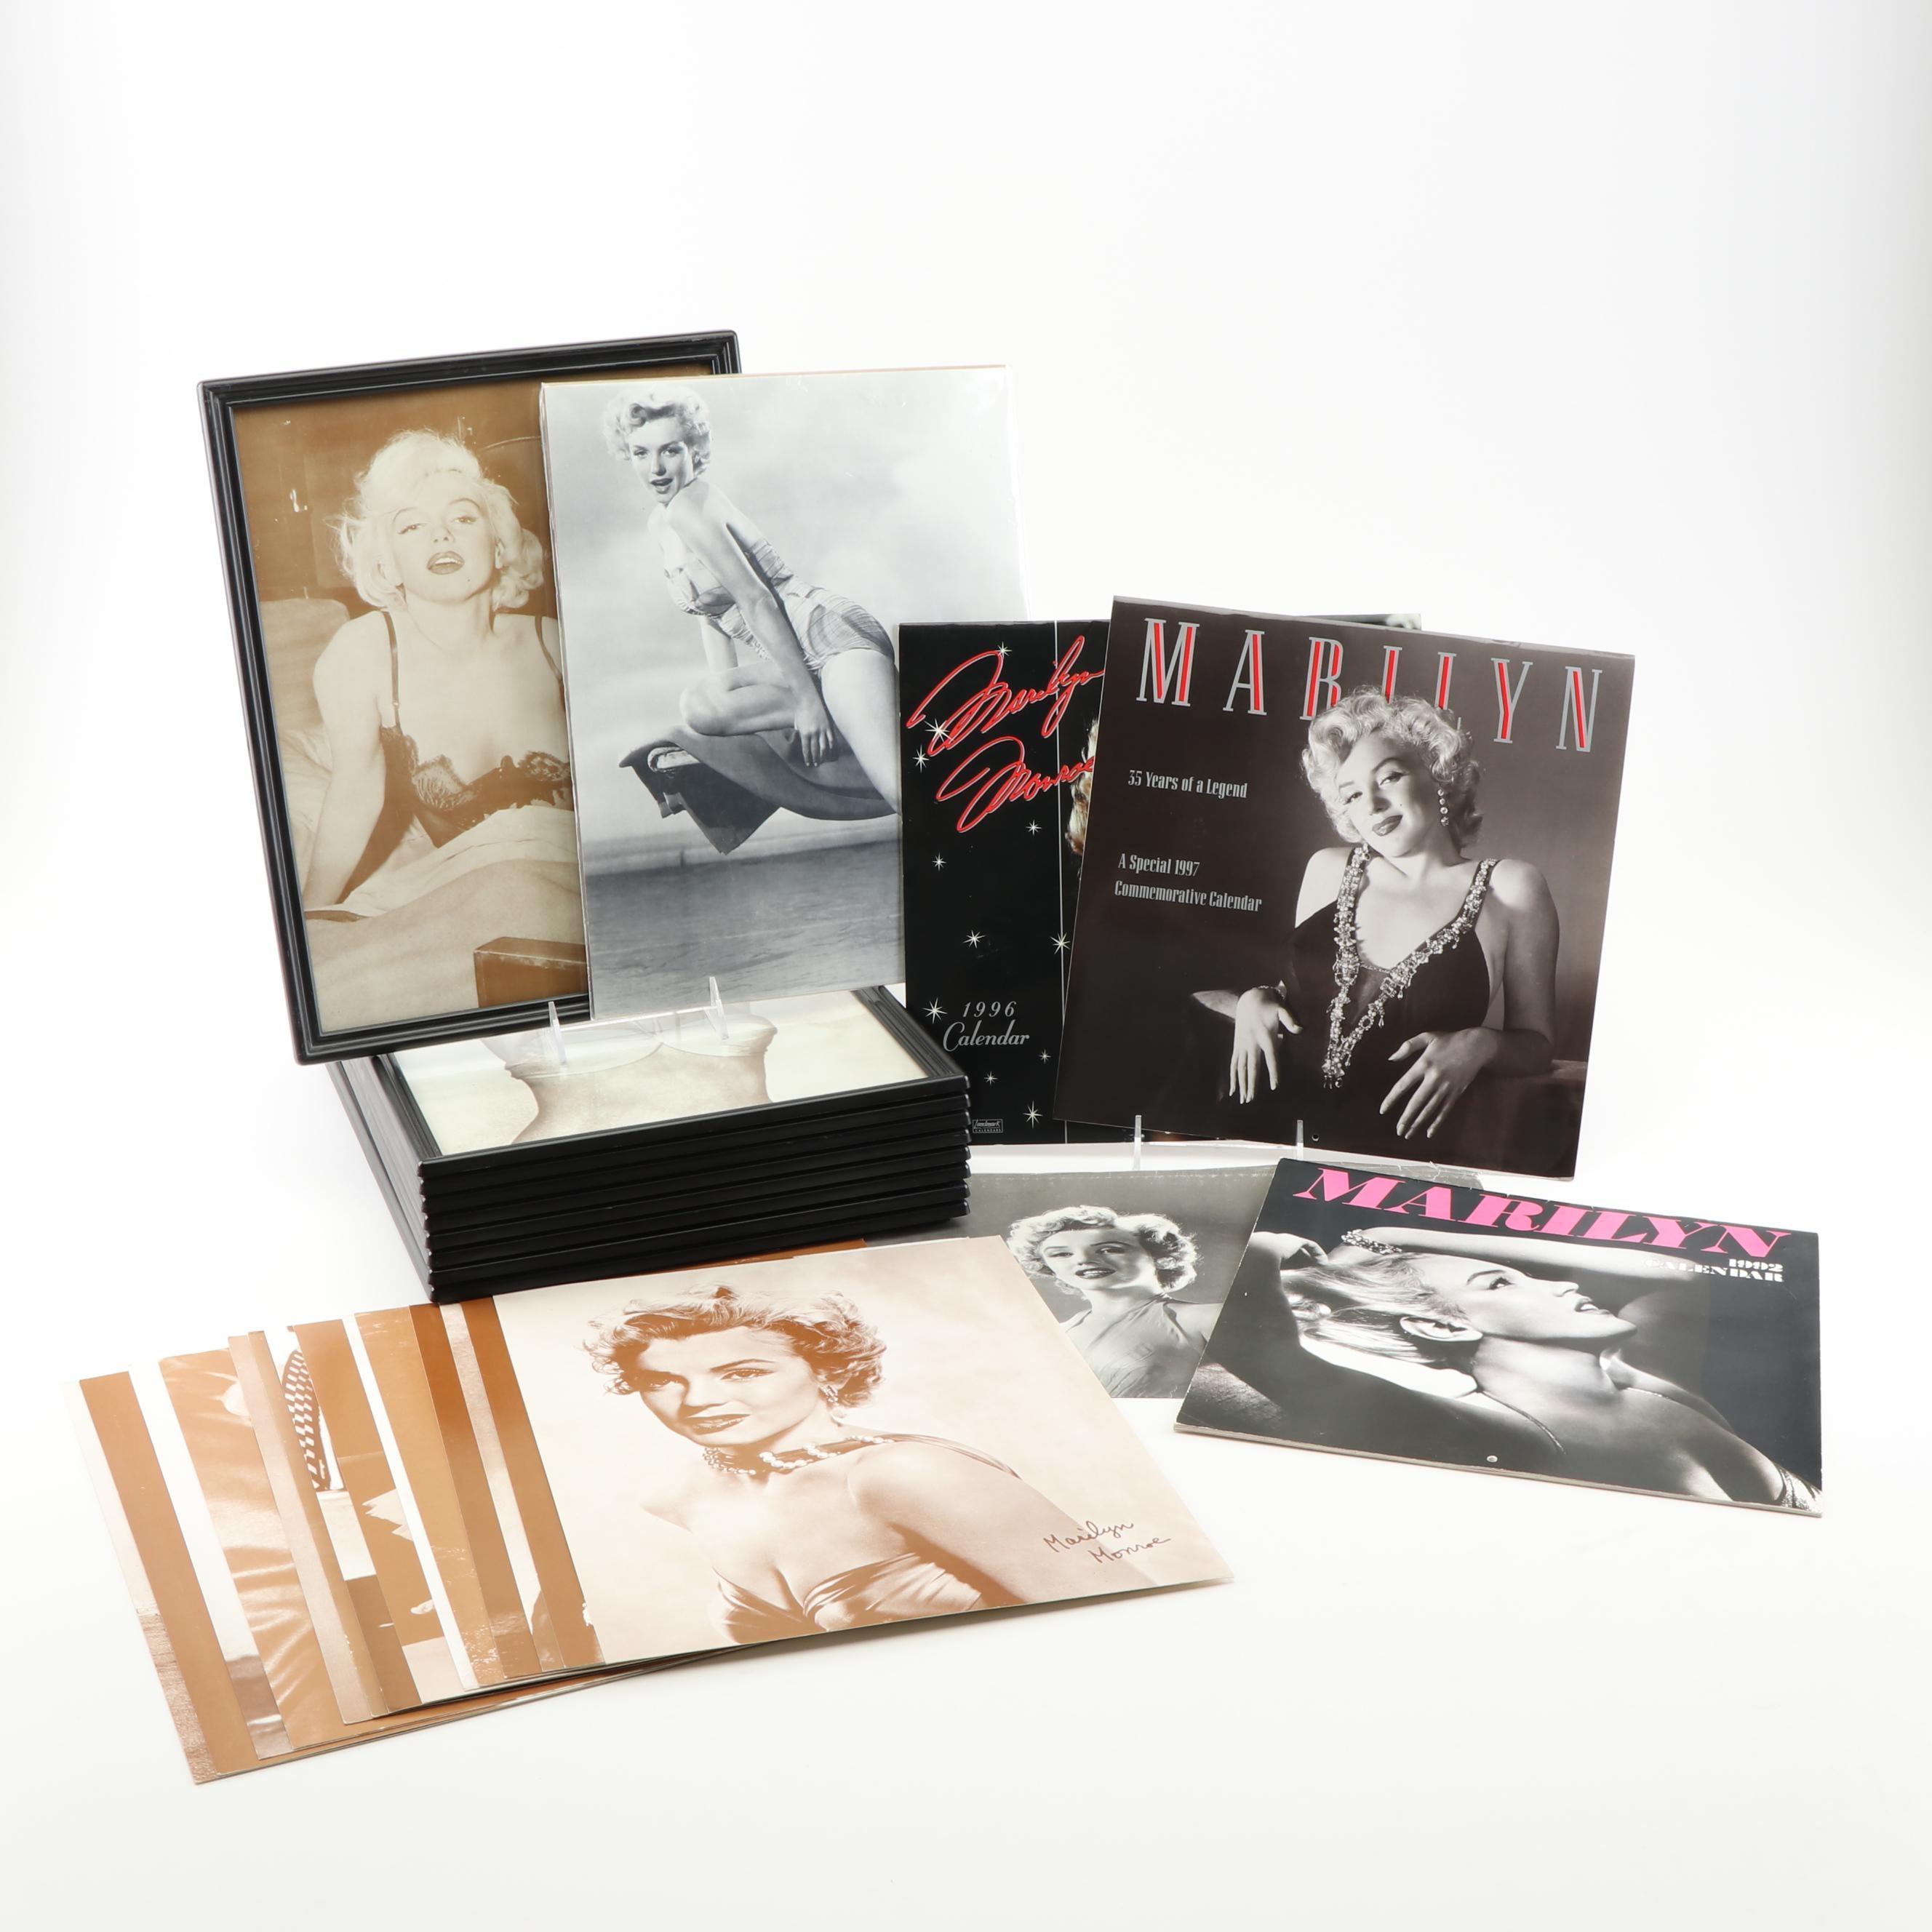 Marilyn Monroe Poster Print and Calendar Grouping